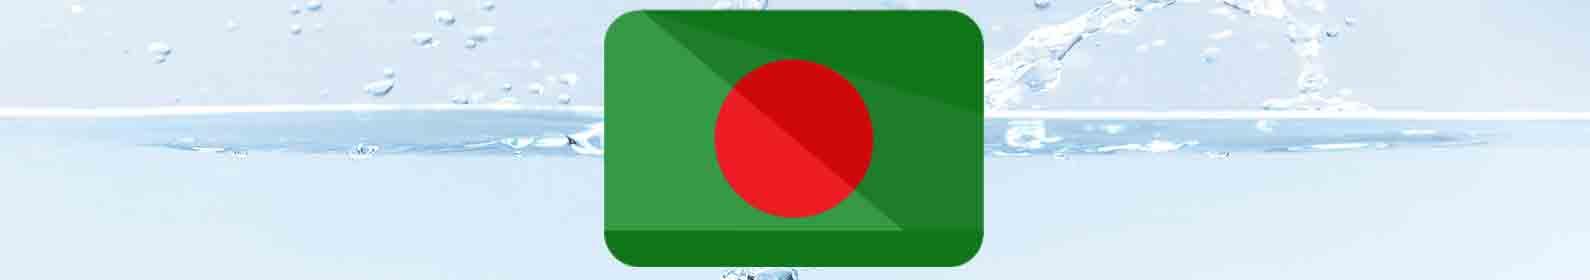 water-treatment-bangladesh.jpg